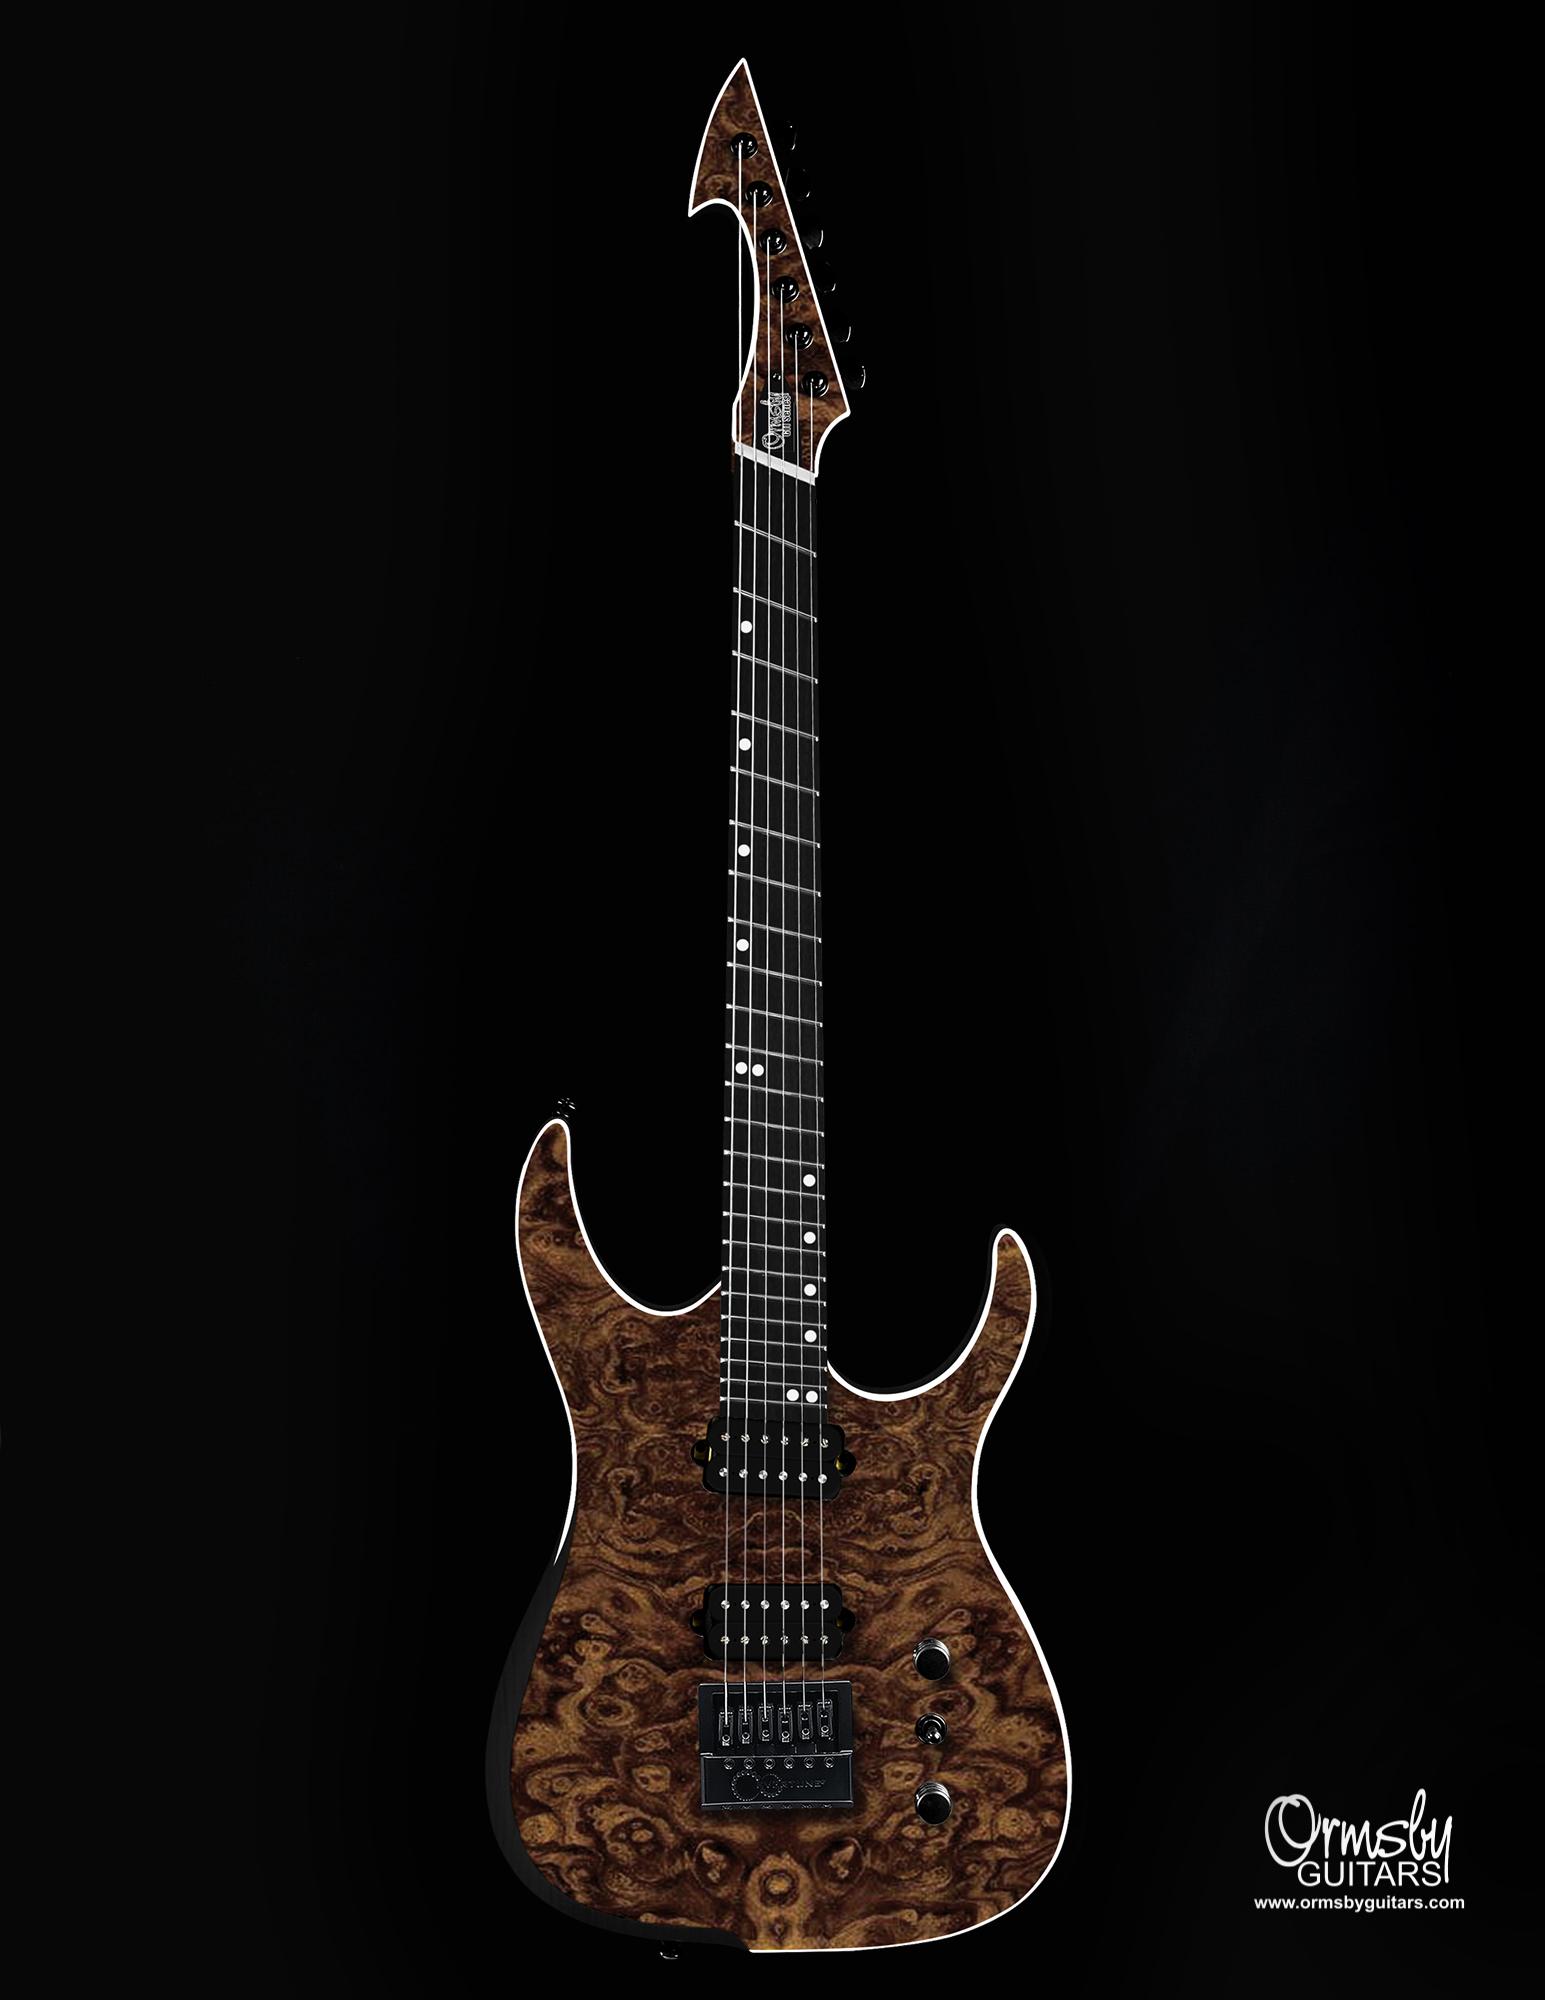 Ormsby Guitars GTI Hype Walnut